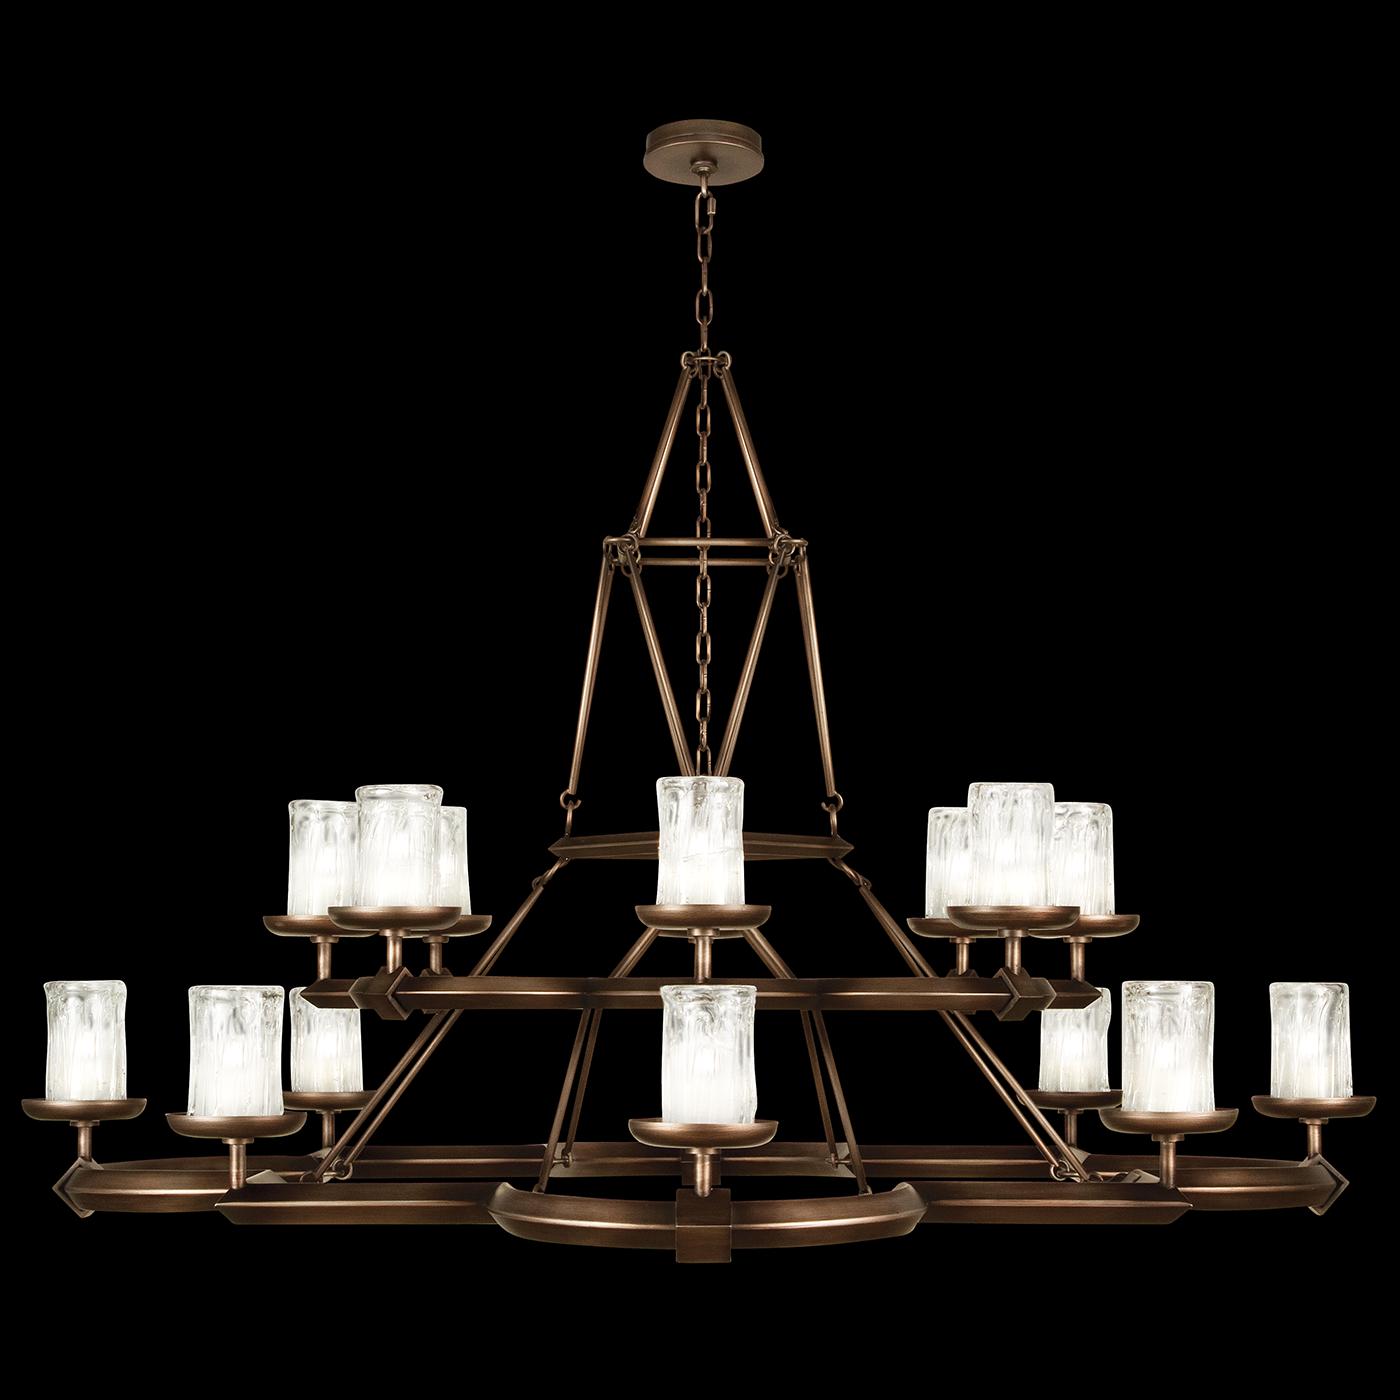 LIAISON - FINE ART HANDCRAFTED LIGHTING